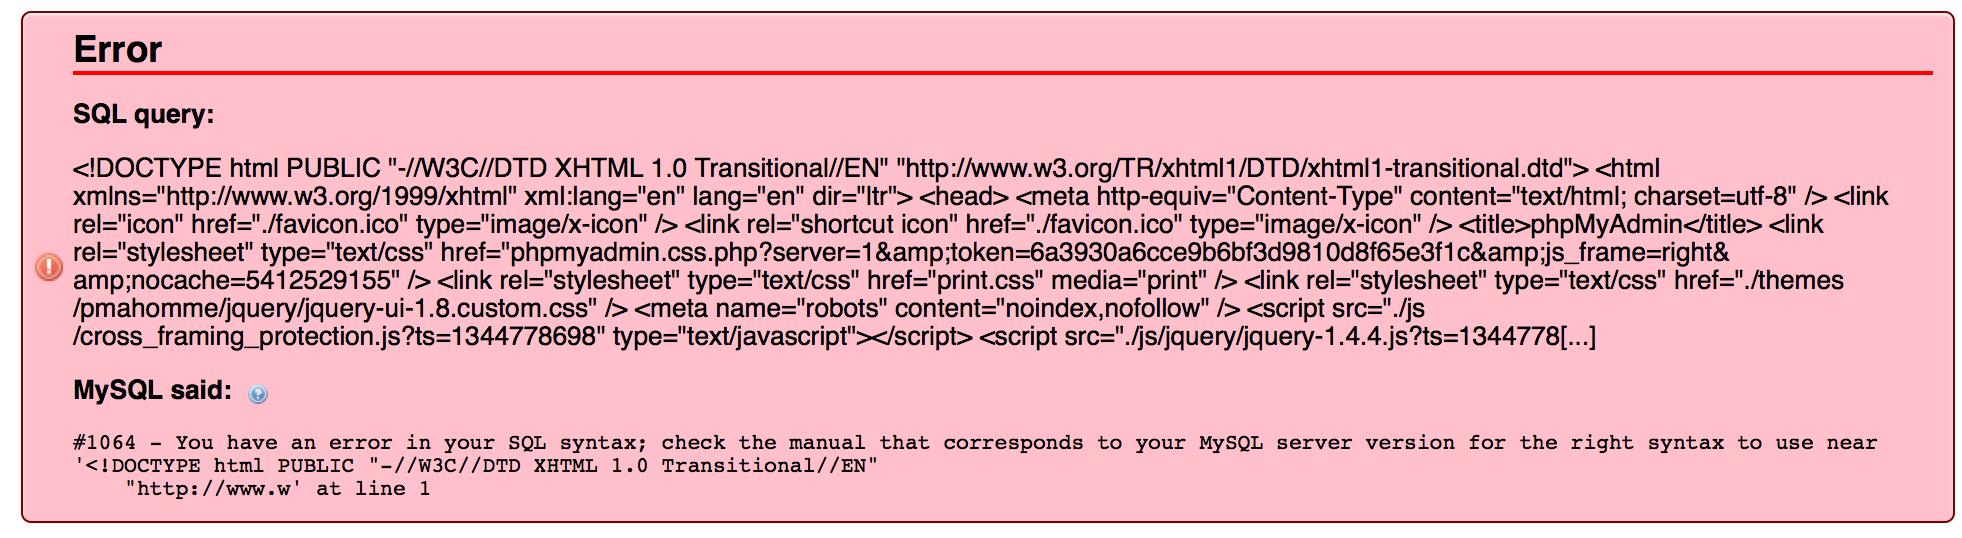 wordpress database import error mysql version mismatch